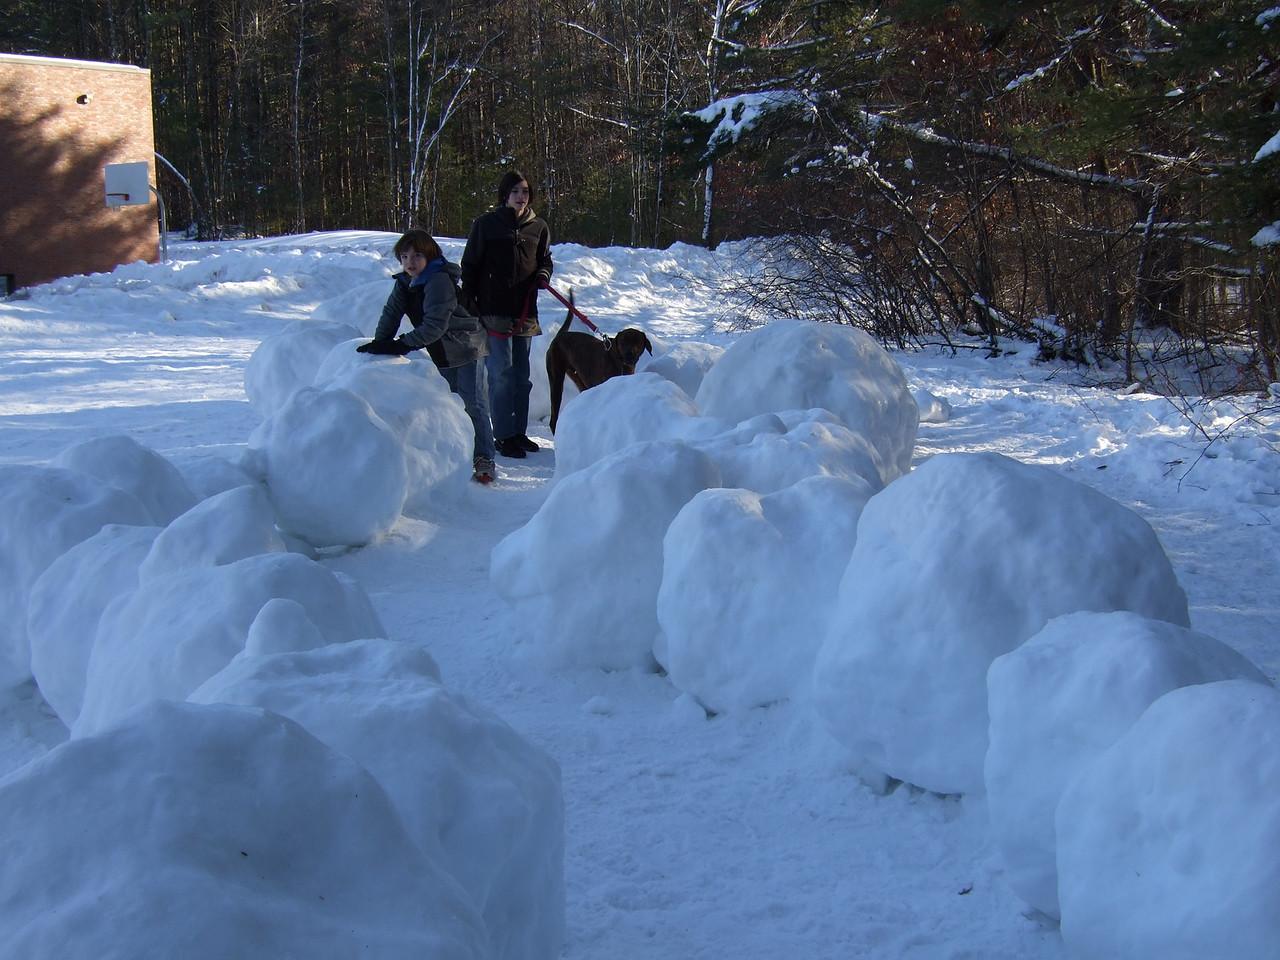 DSCF8007 Brian, Ian, Aaron giant snow balls